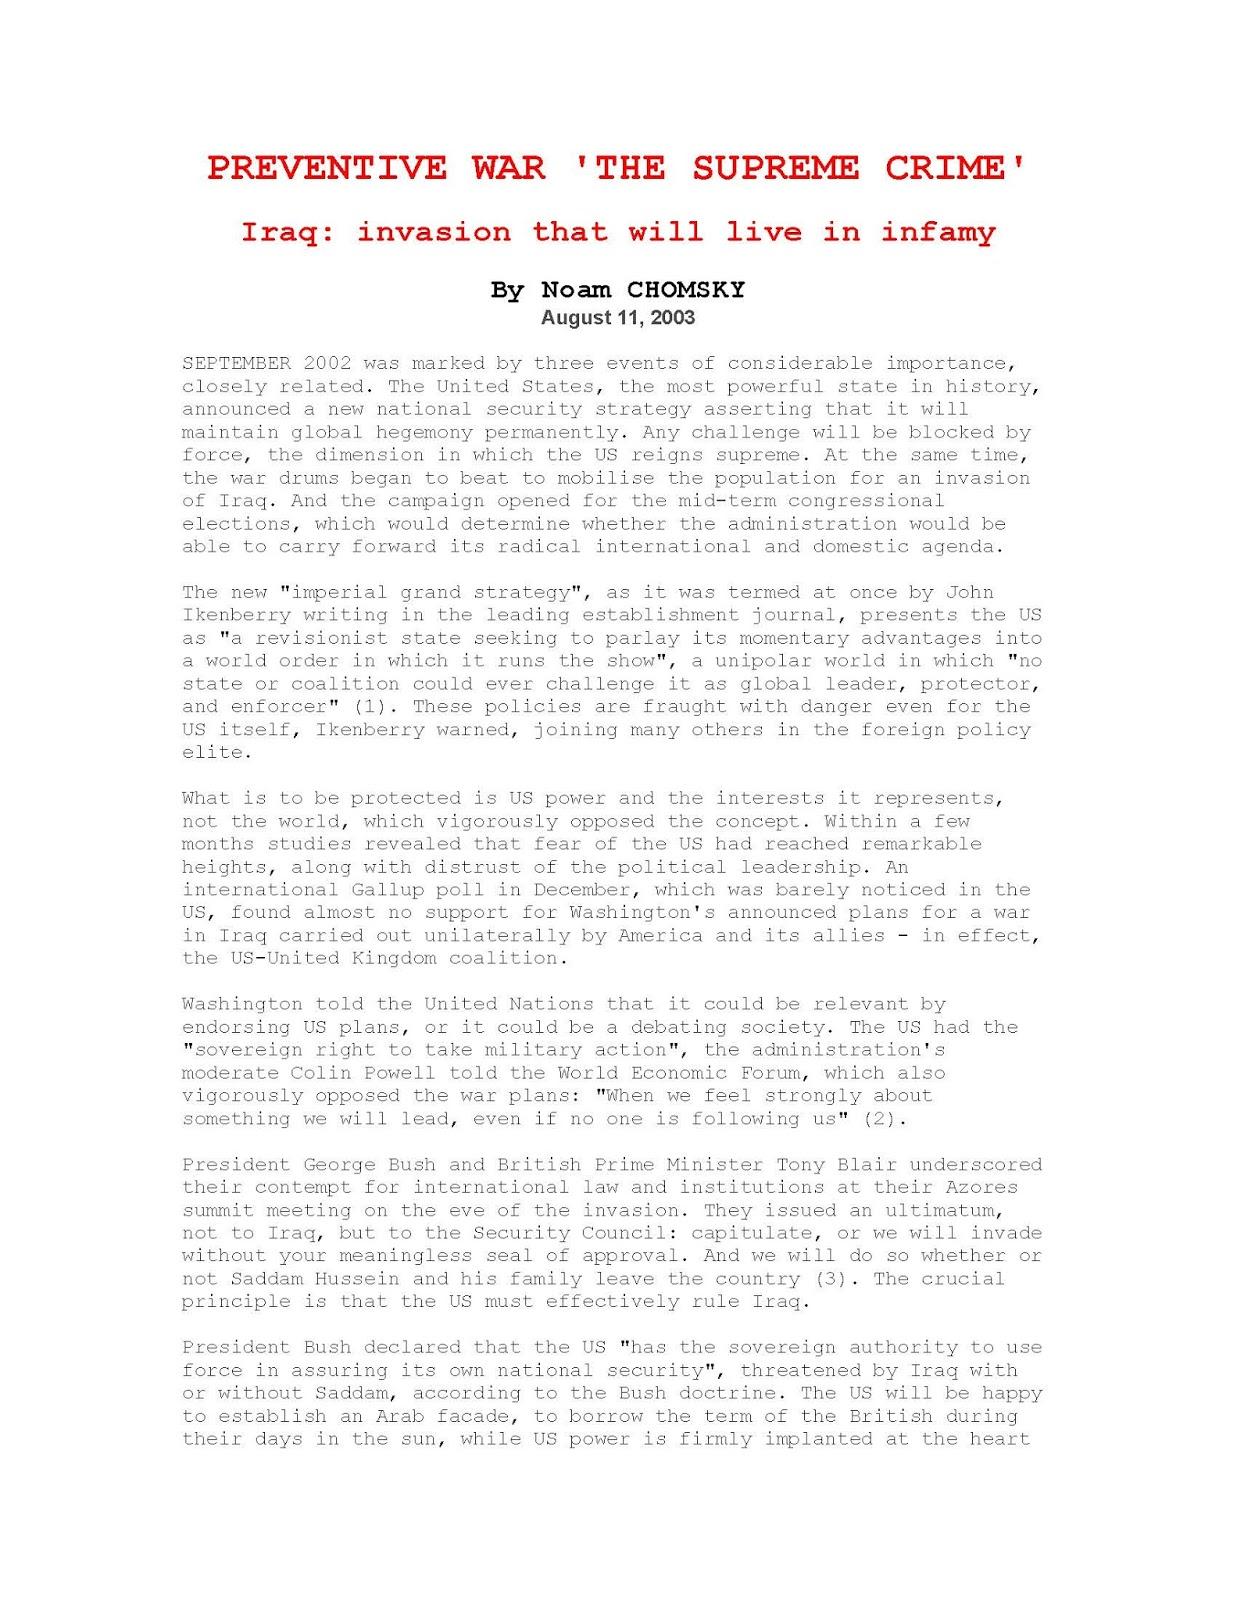 70489 pages2bde2bpreventive2bwar2c2bthe2bsupreme2bcrime - Preventive War 'The Supreme Crime' Iraq: invasion that will live infamy PDF - Noam Chomsky